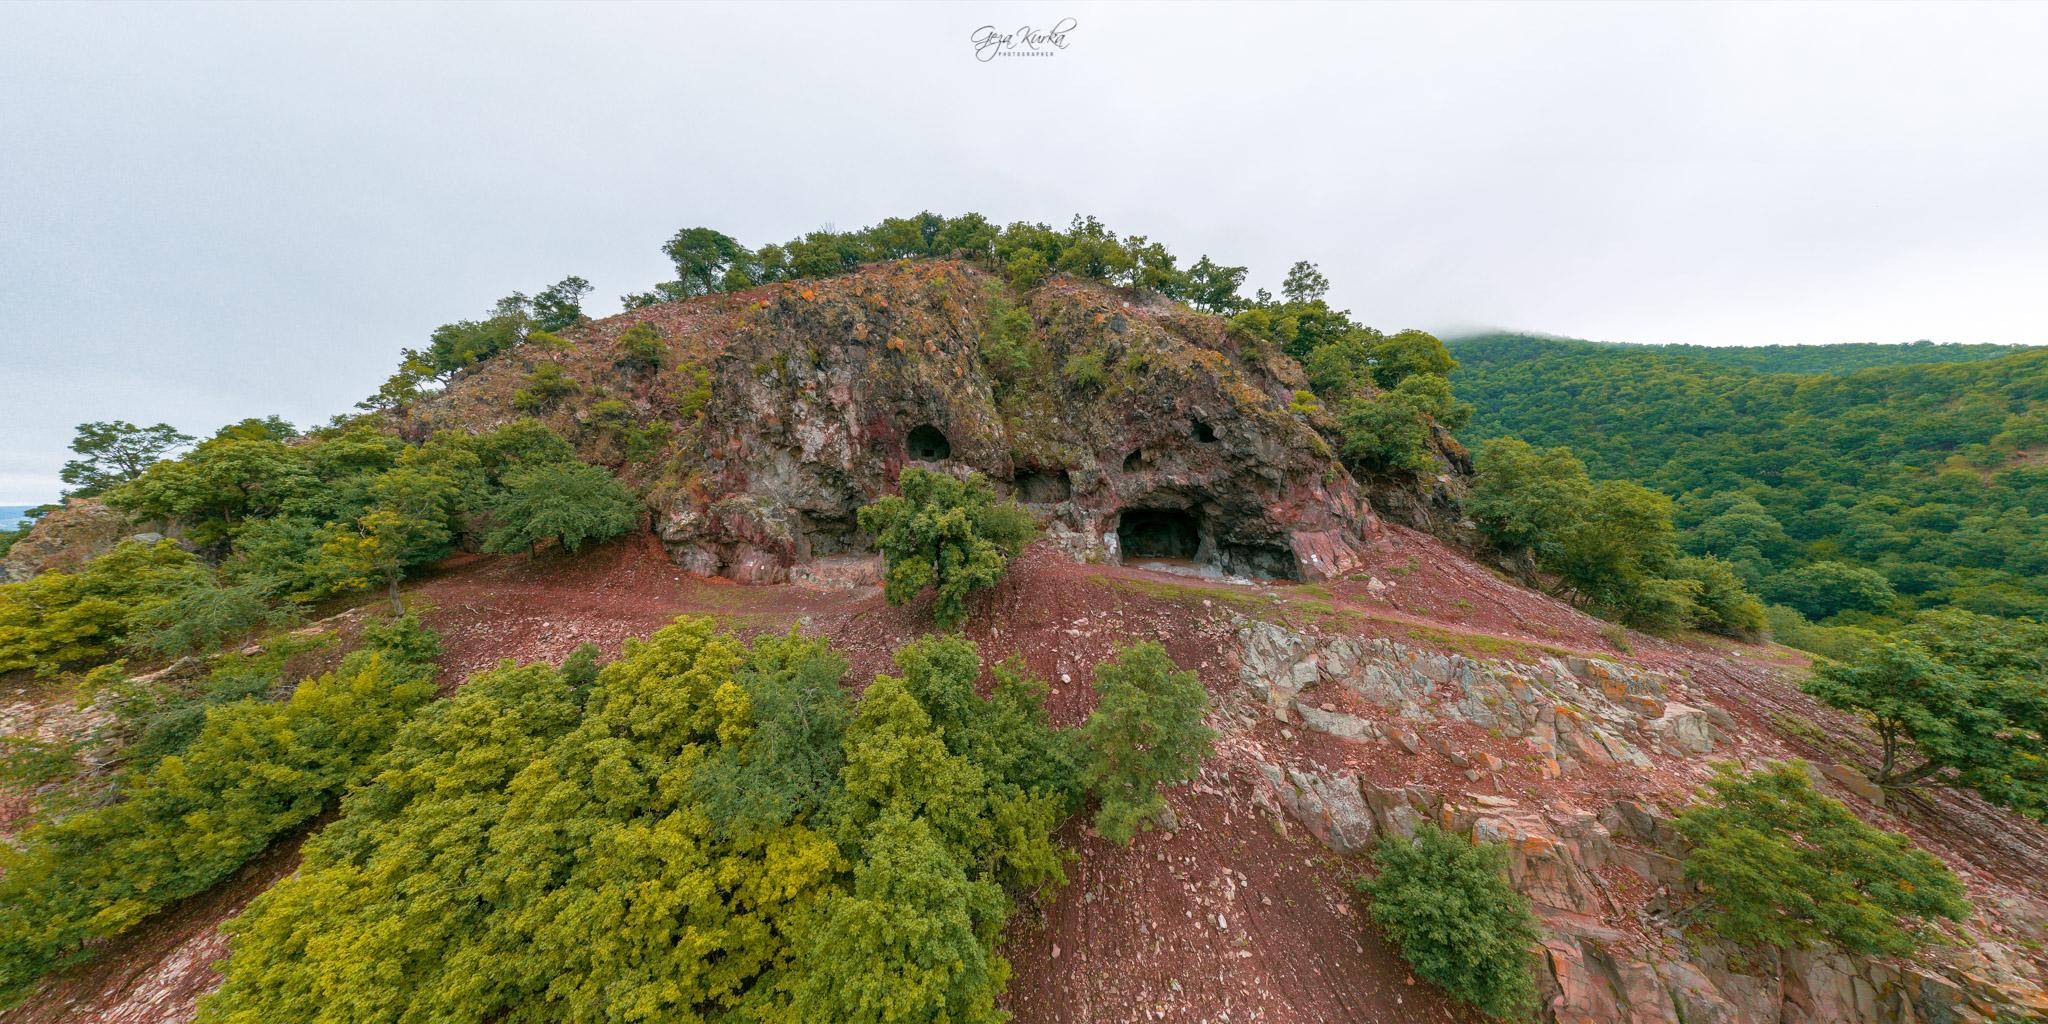 Hermit caves in Danube bend, Hungary